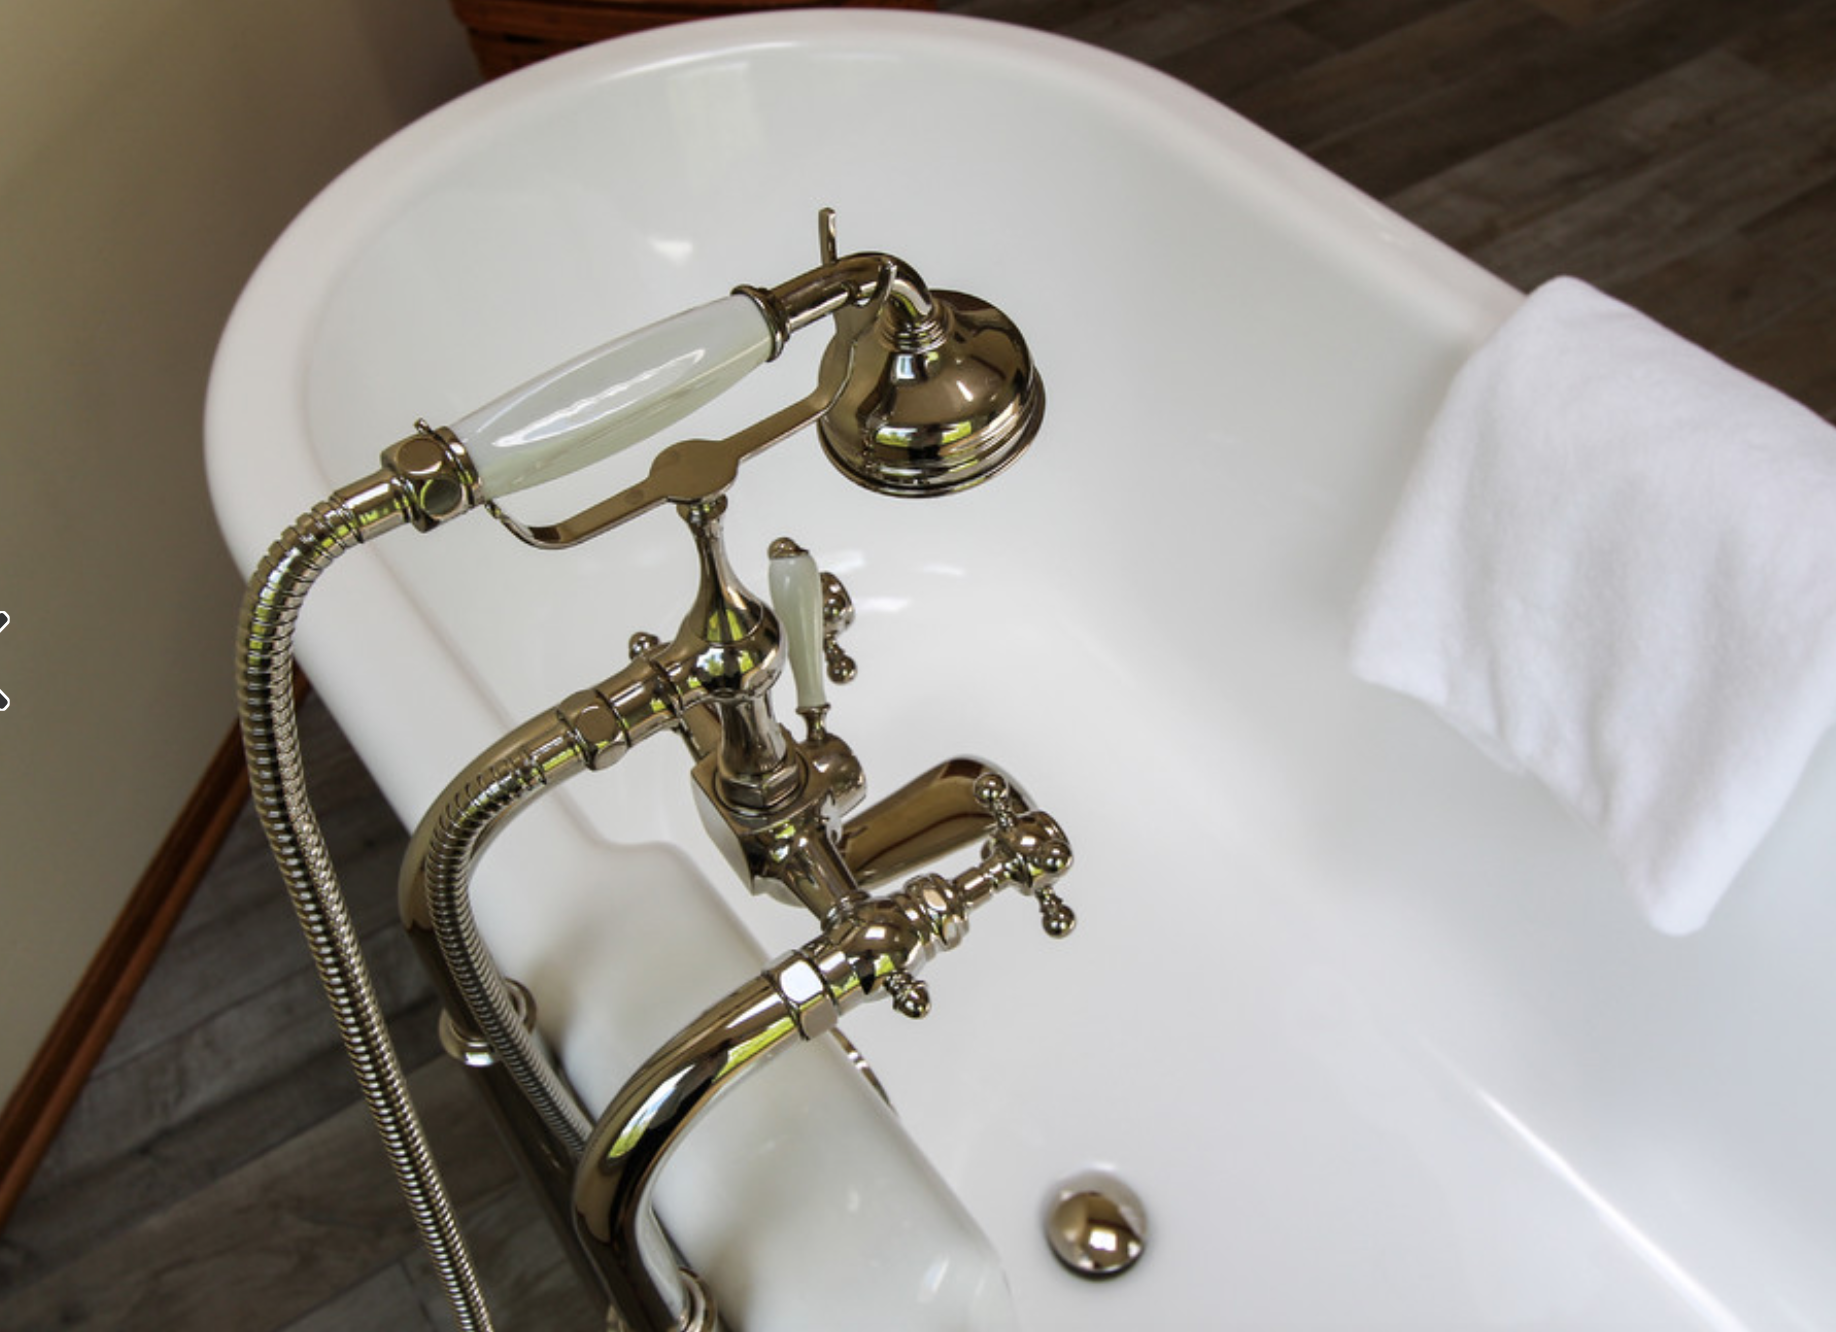 Beautiful bathtub faucet. Unique finish for an old-fashioned tub ...